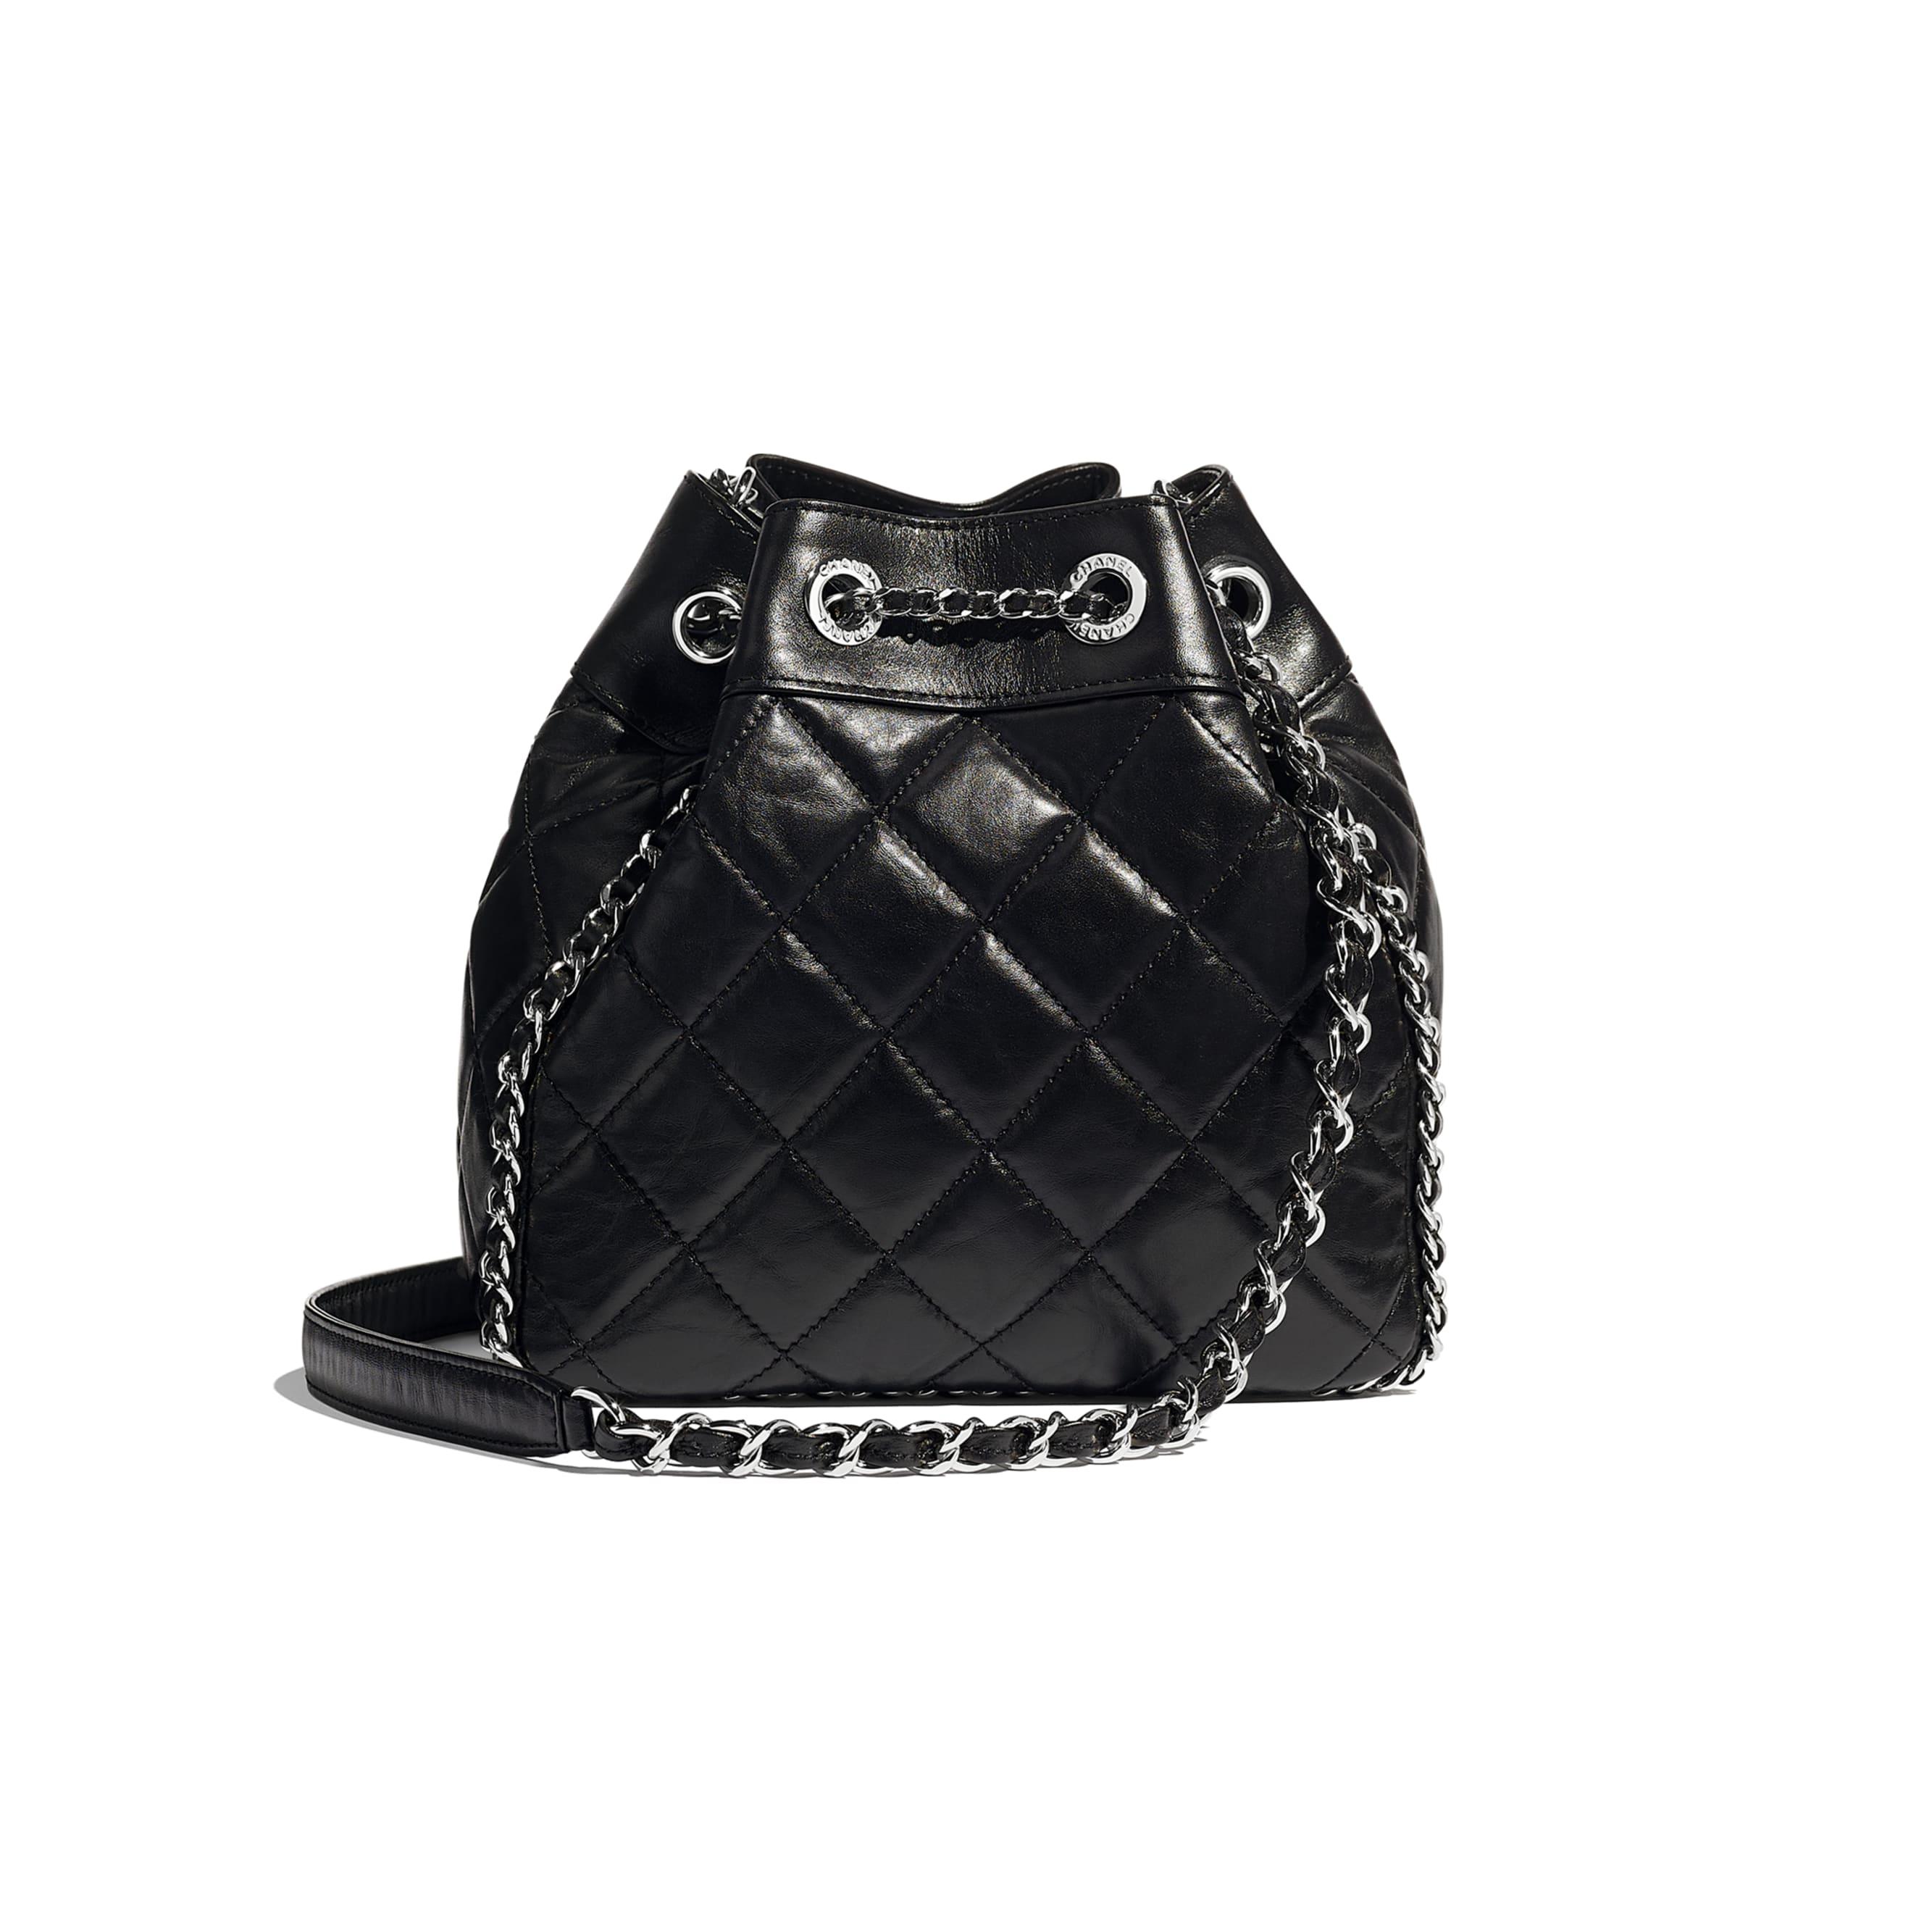 Drawstring Bag - Black - Aged Calfskin & Silver-Tone Metal - CHANEL - Alternative view - see standard sized version